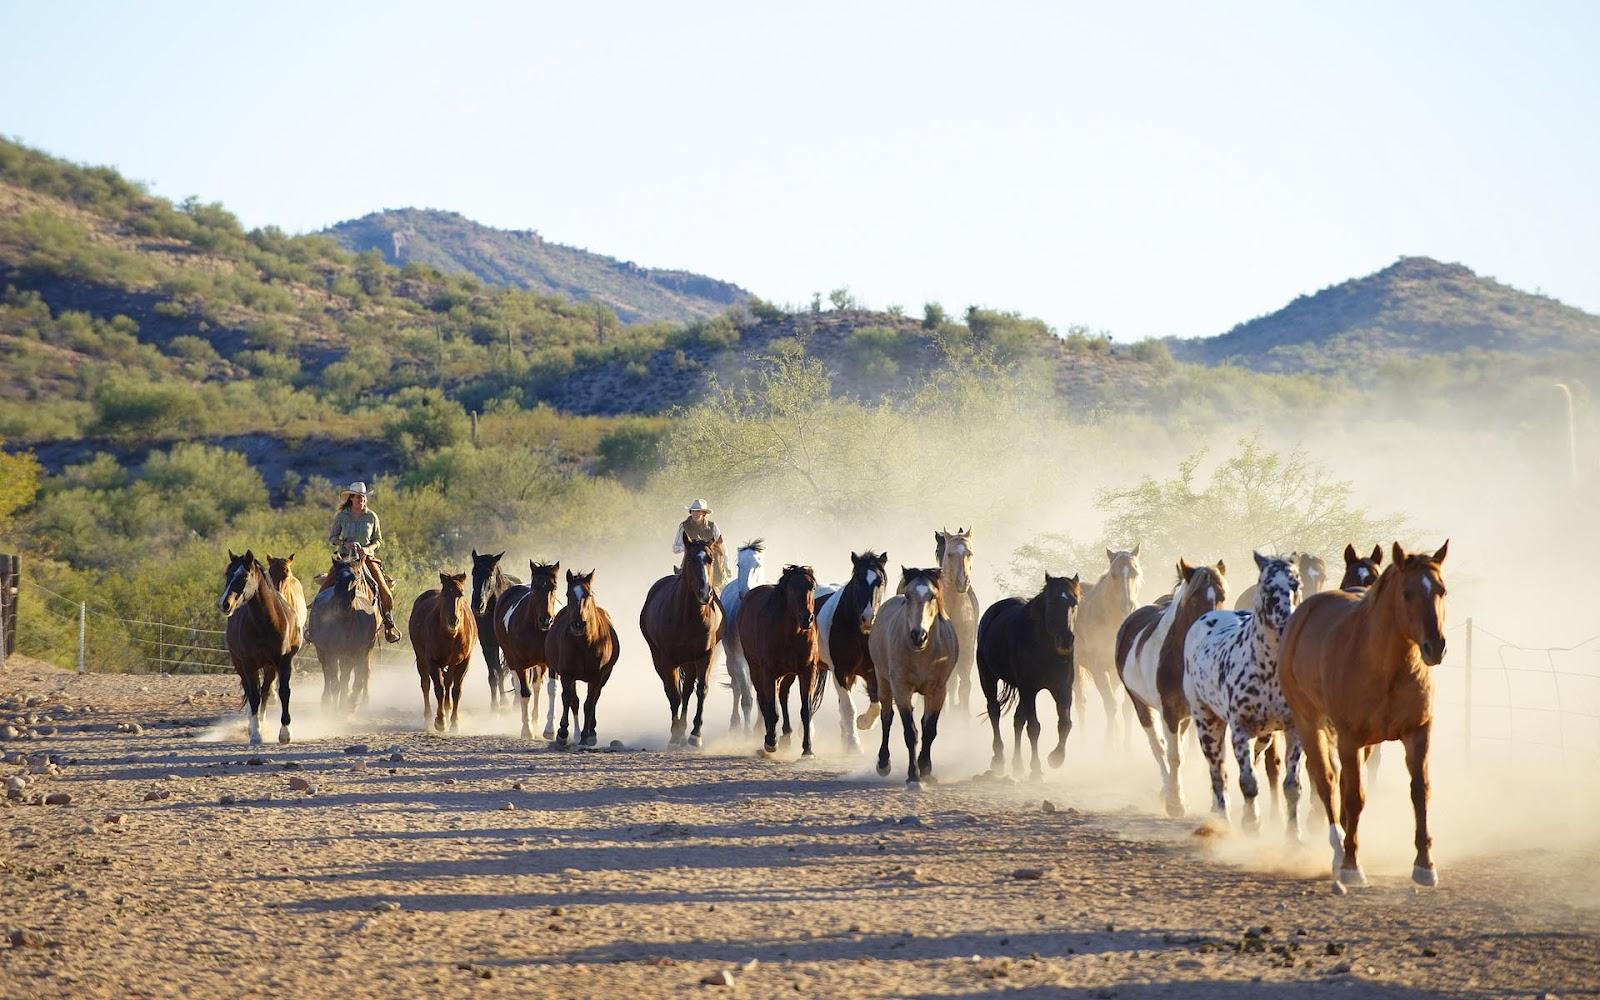 HD paarden achtergronden en fotou0026#39;s : Bureaublad Achtergronden